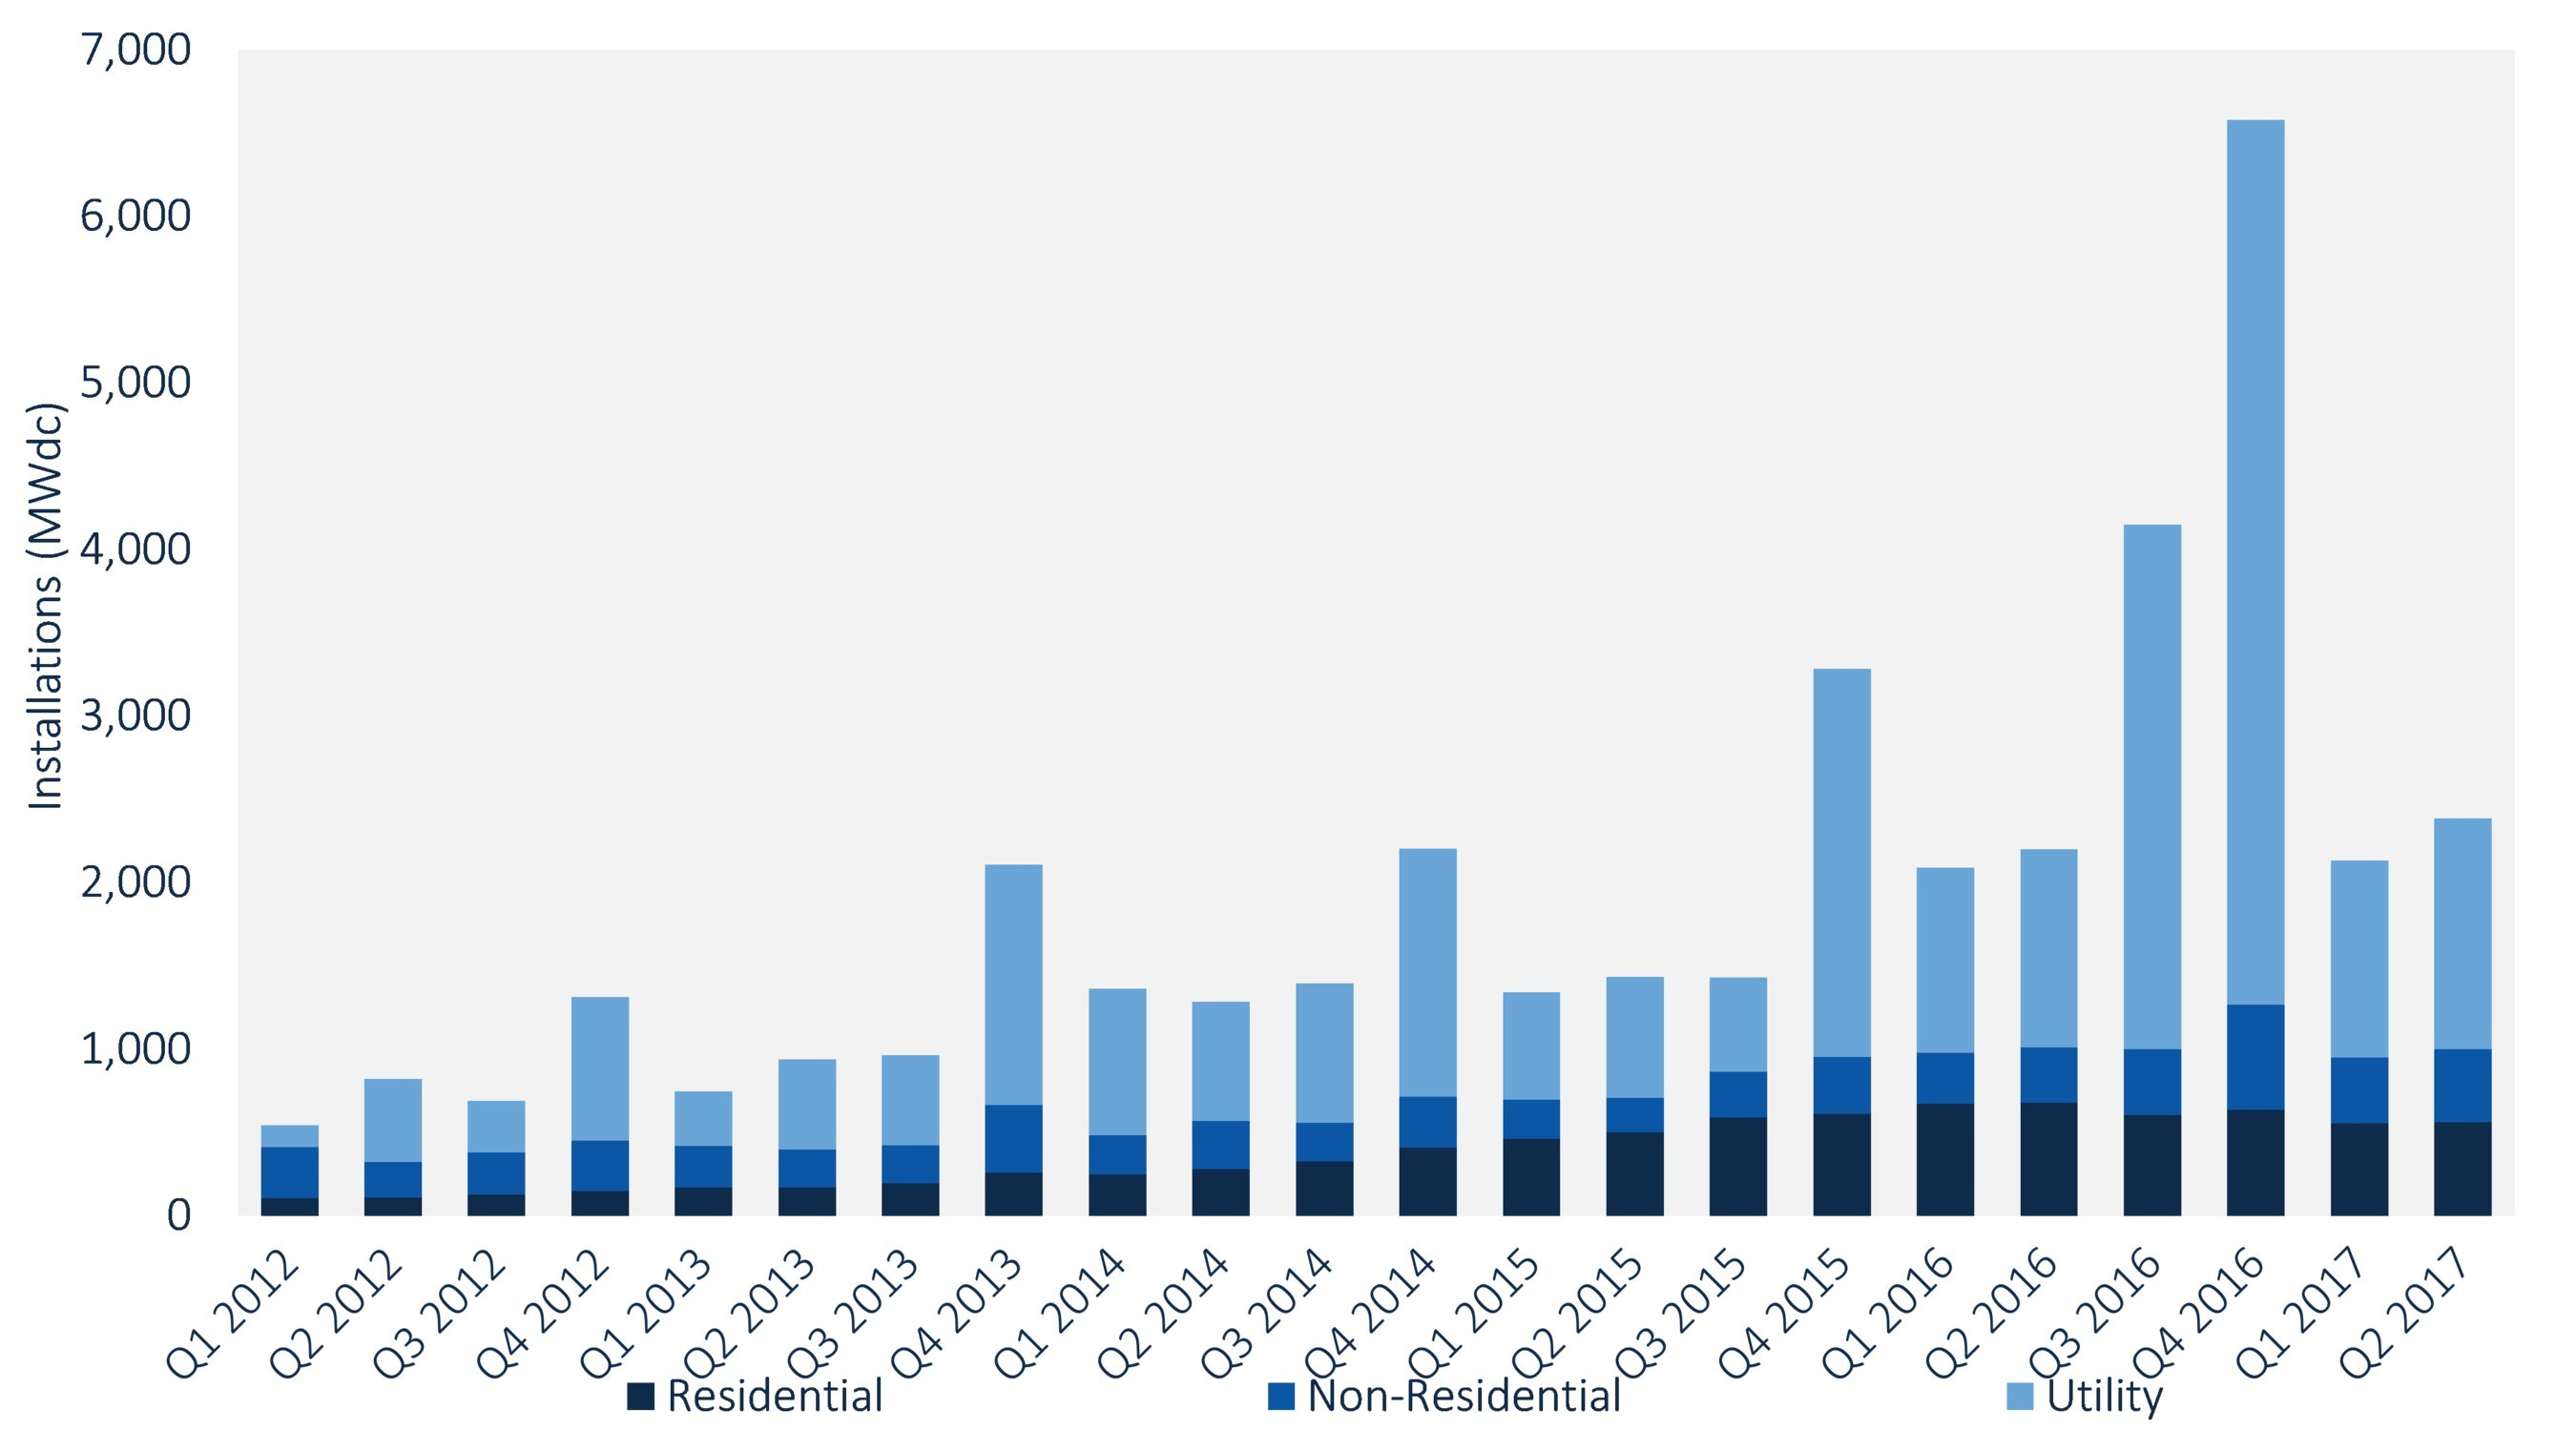 FIGURE: U.S. Quarterly PV Installations Q1 2012-Q2 2017. Source: GTM Research / SEIA U.S. Solar Market Insight Report, Q3 2017